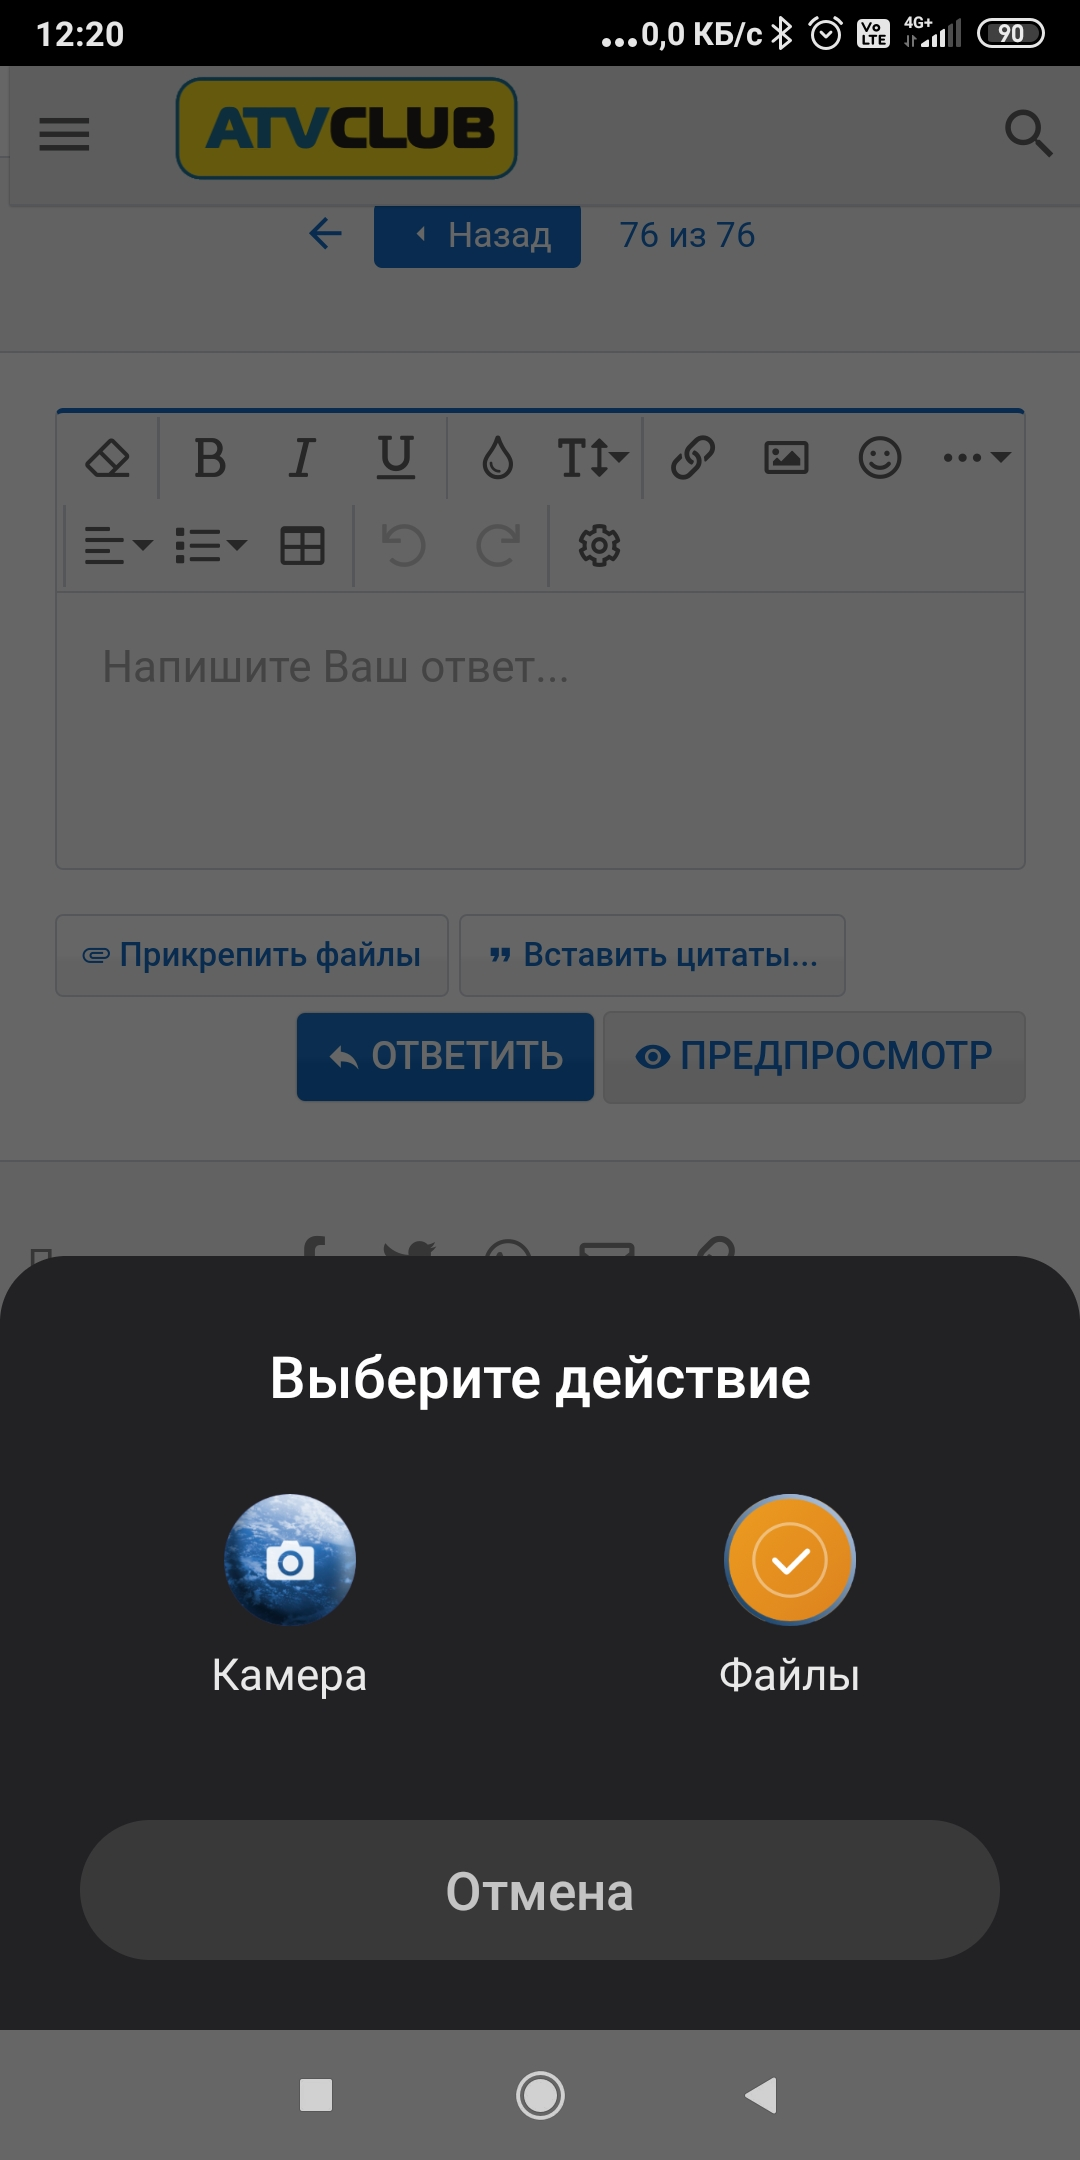 Screenshot_2021-09-16-12-20-13-780_android.jpg